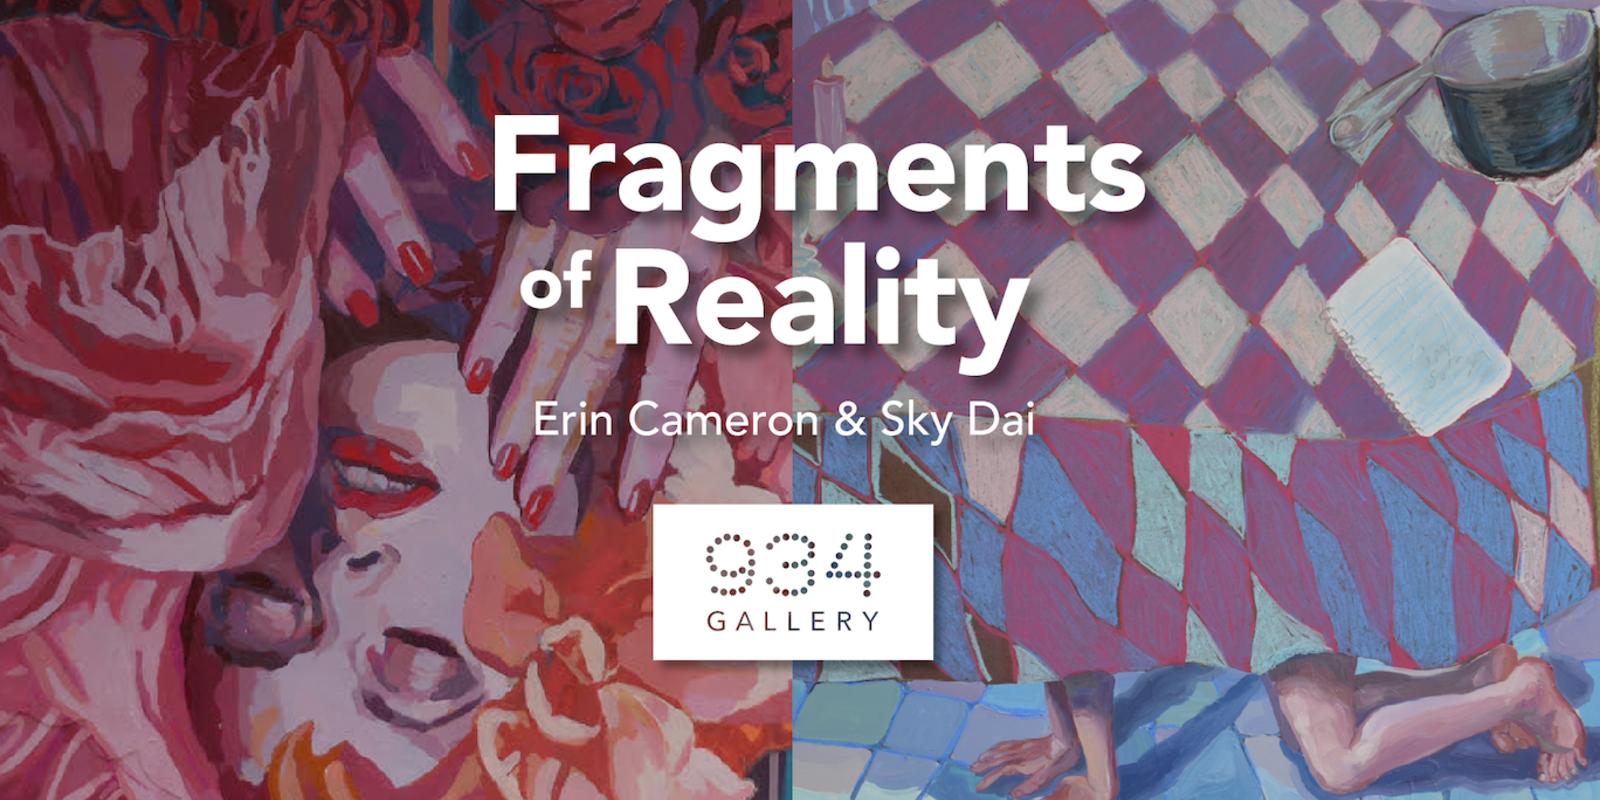 Fragments of Reality: Erin Cameron & Sky Dai